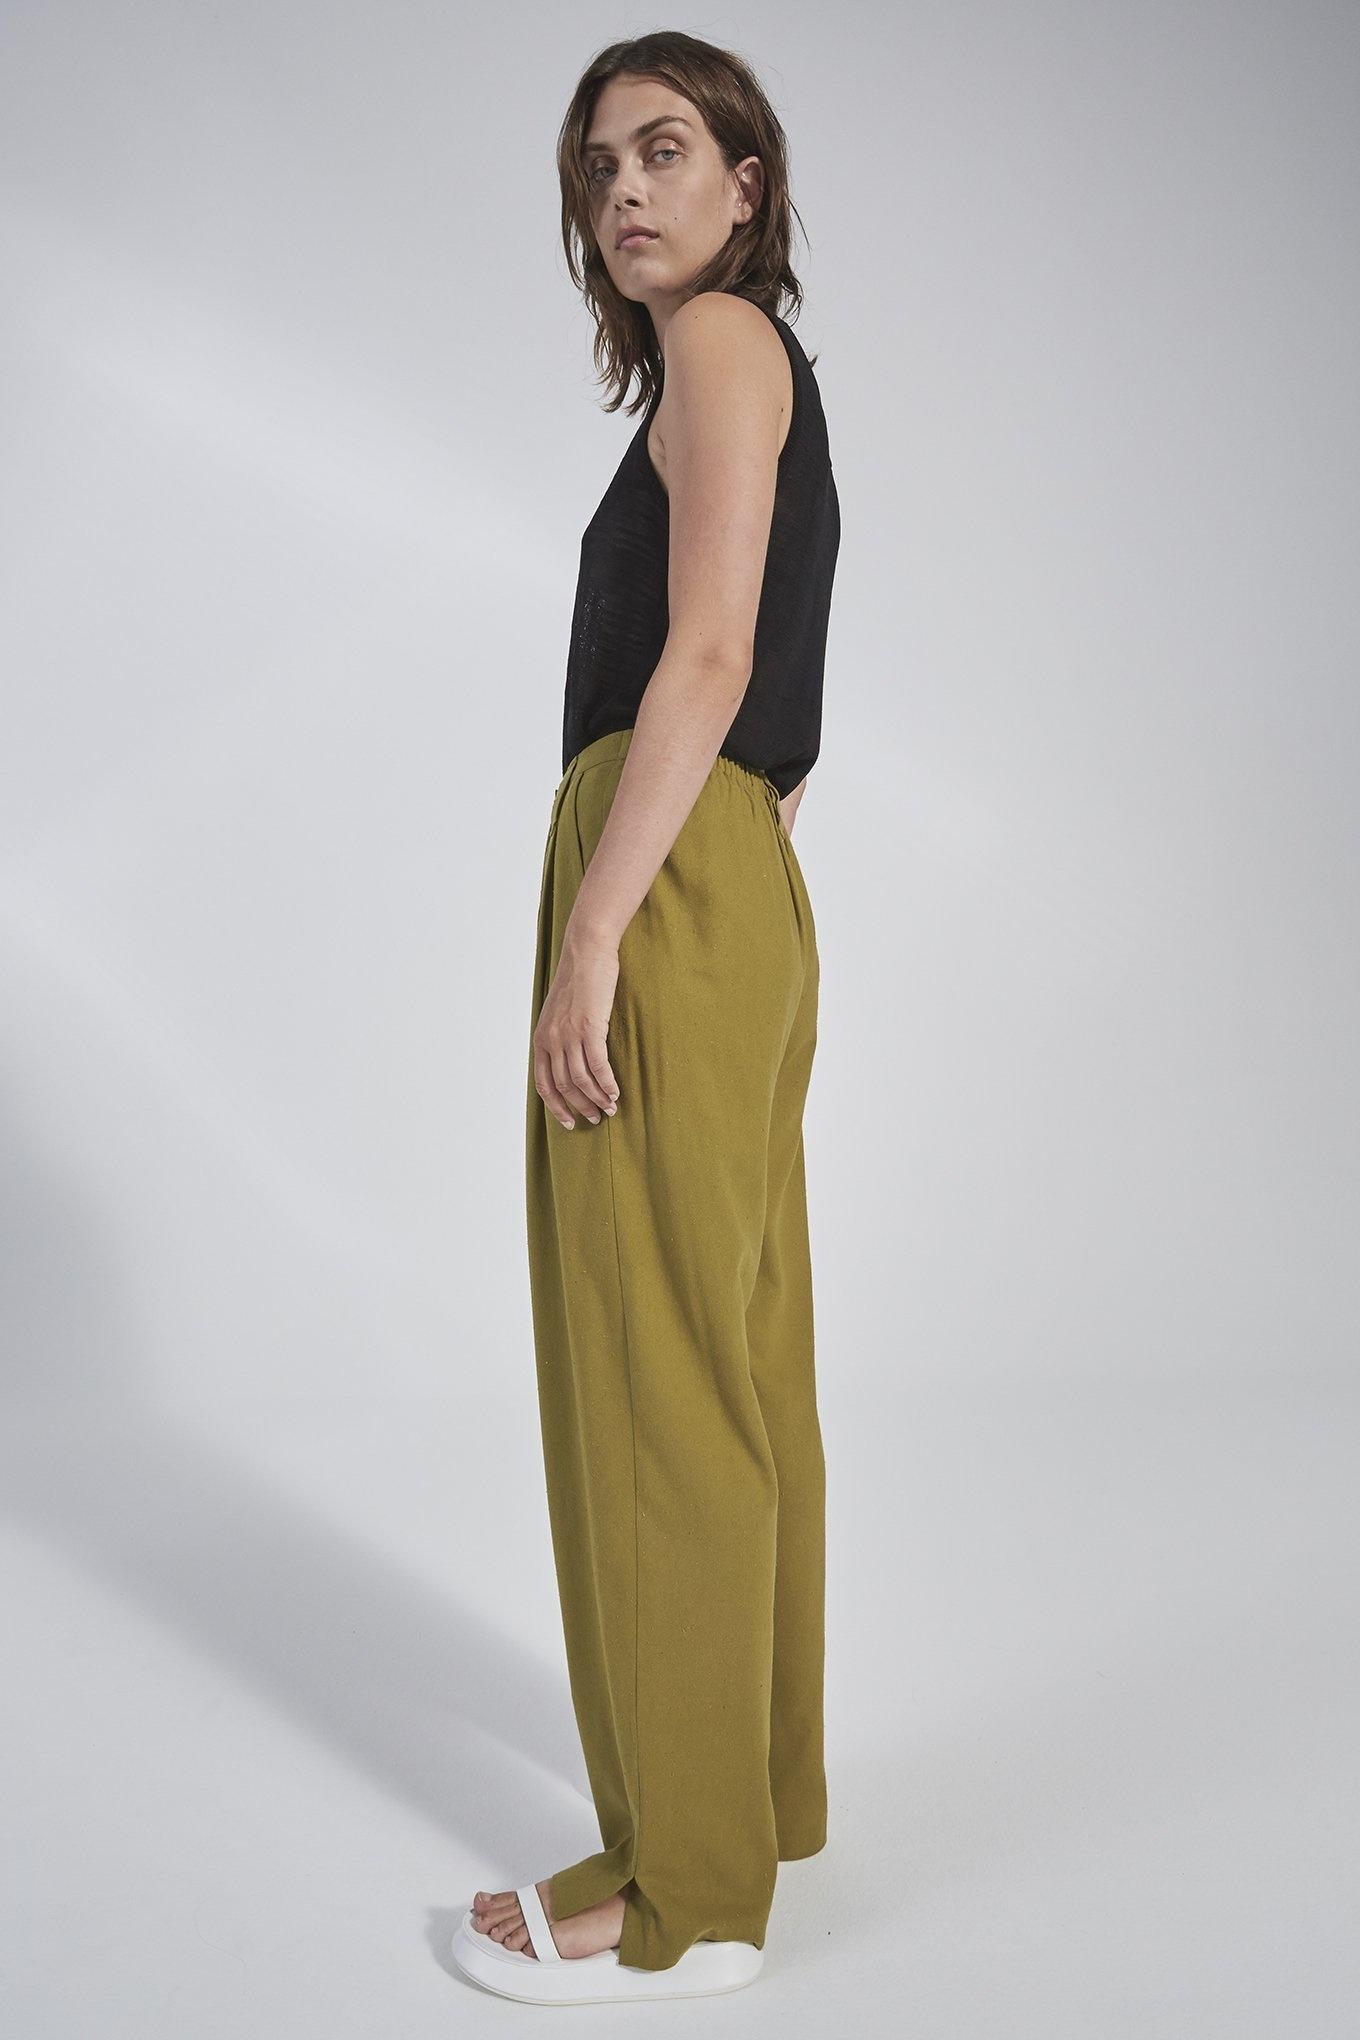 Harry trouser Pickle Green